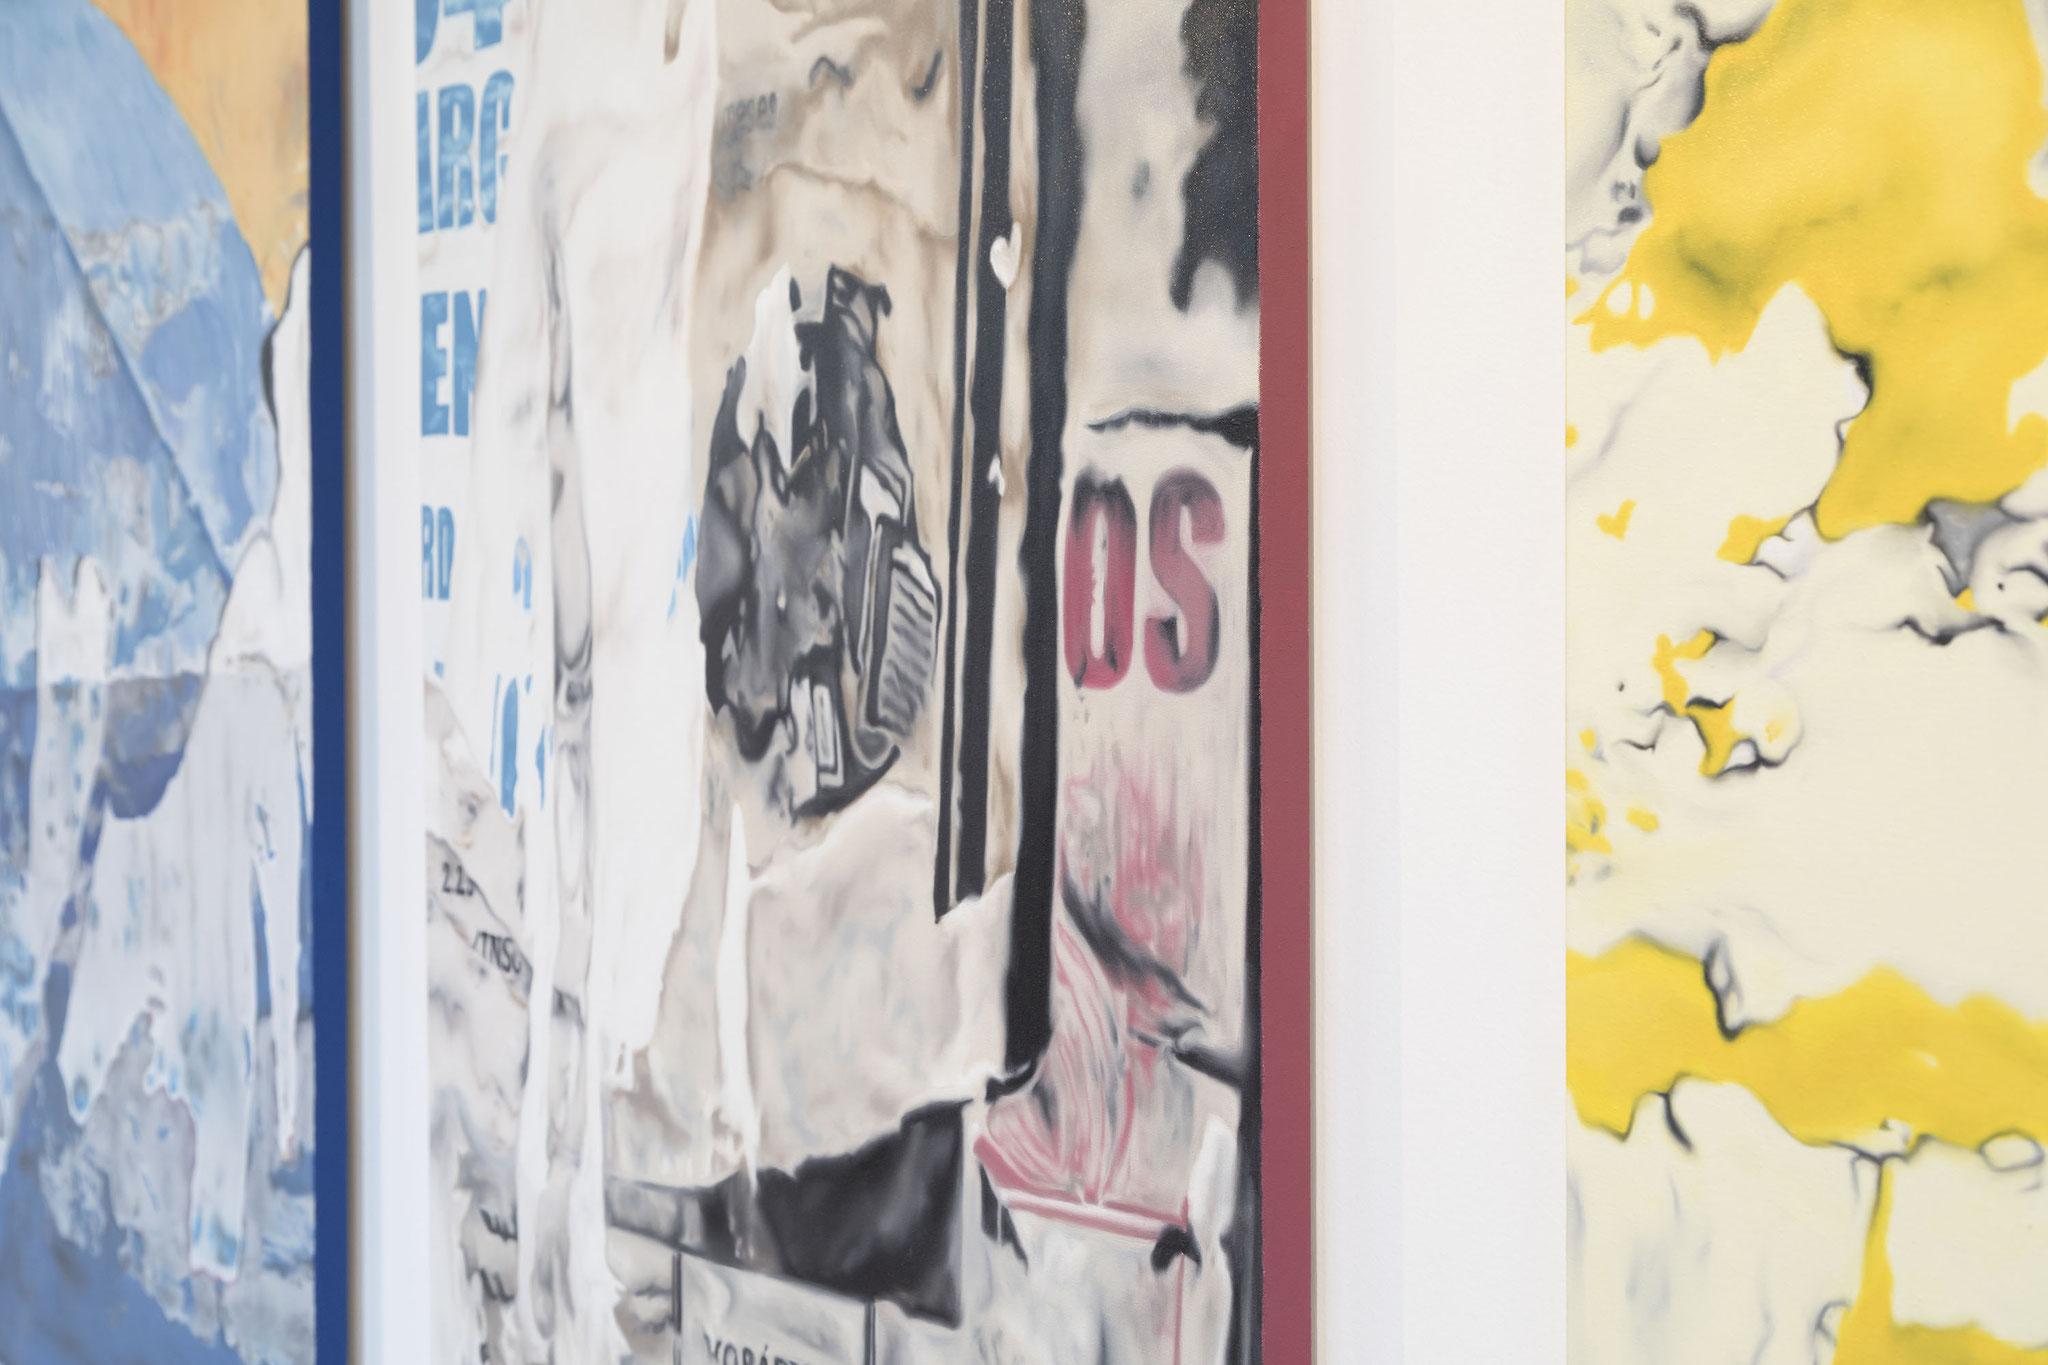 """jetlag - out of sync"", triennale jeune création, rotondes '17, photo by bohumil kostohryz"